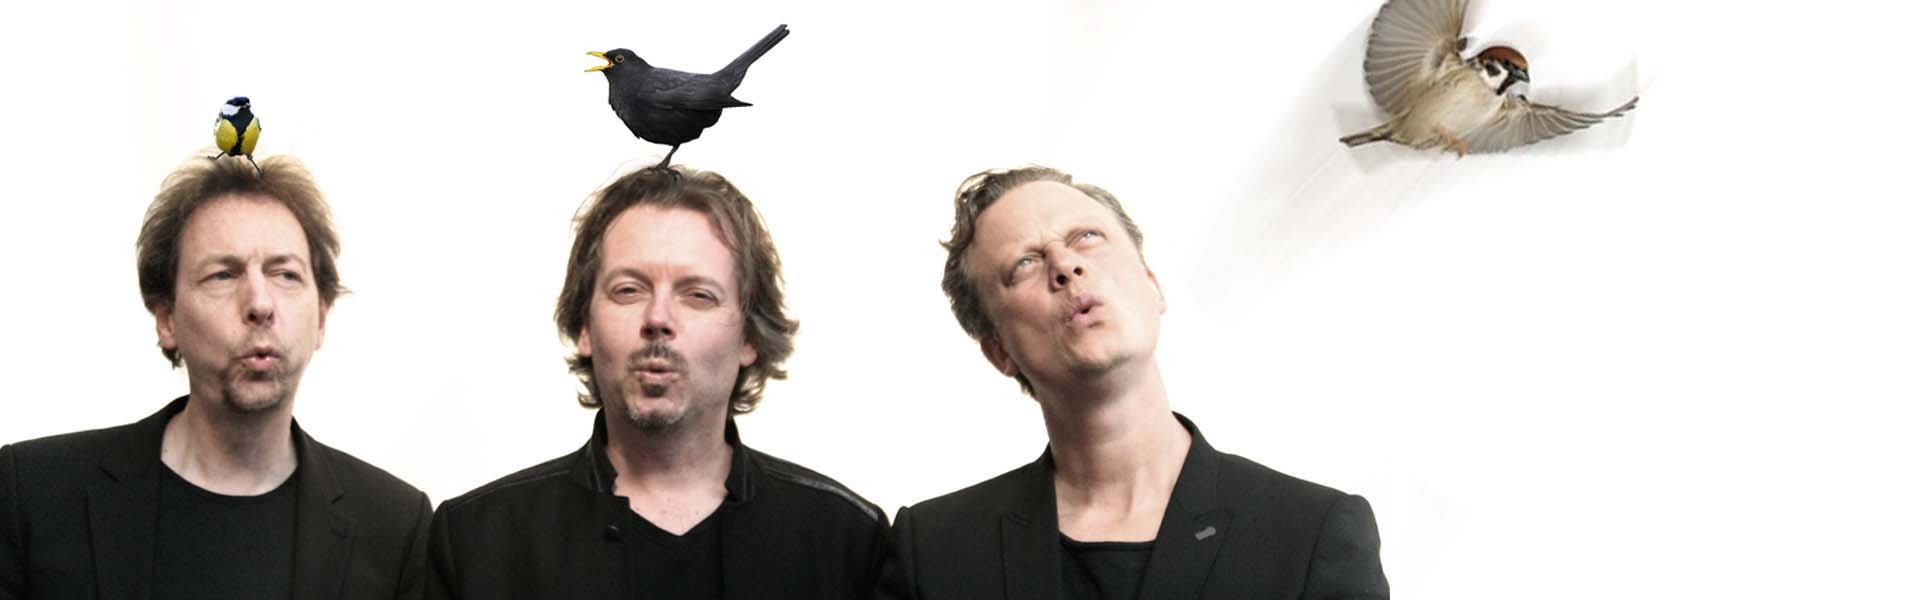 Markus Schinkel Trio